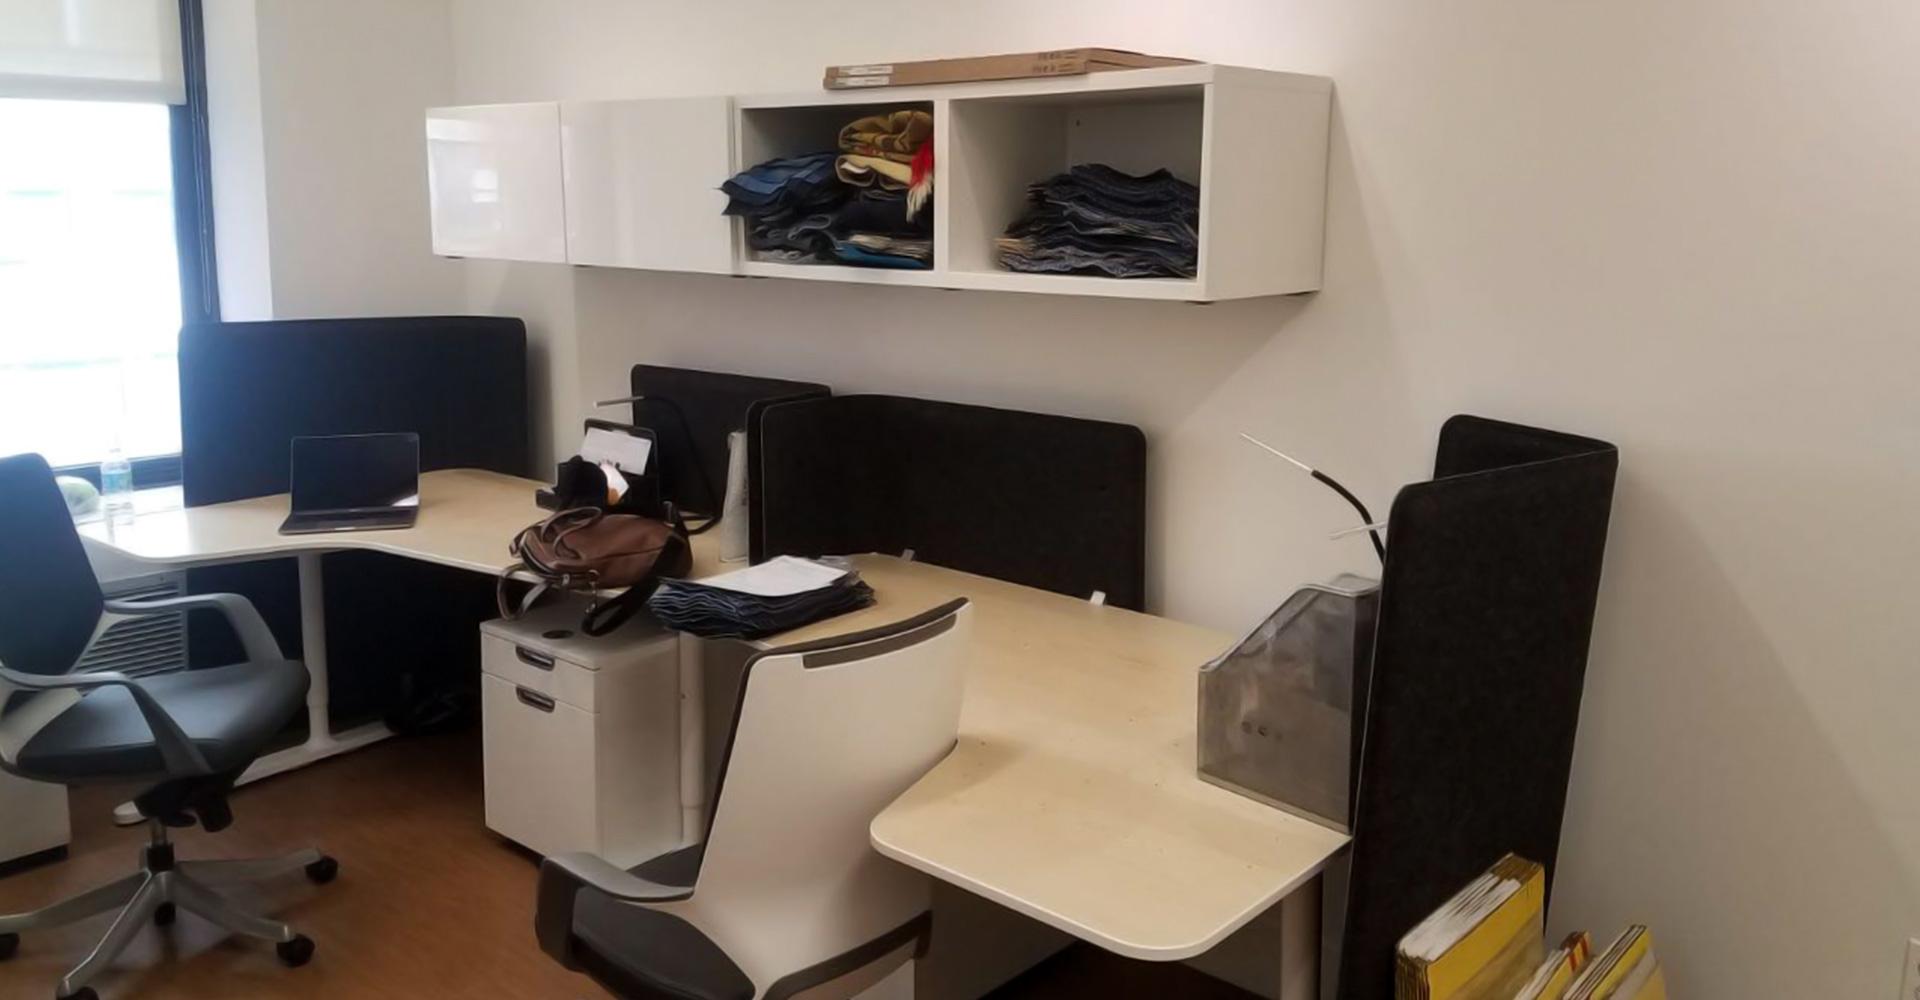 Trade-show-Interior-Design-Hiline-Lahore-portfolio-us-group-new-work-office-05